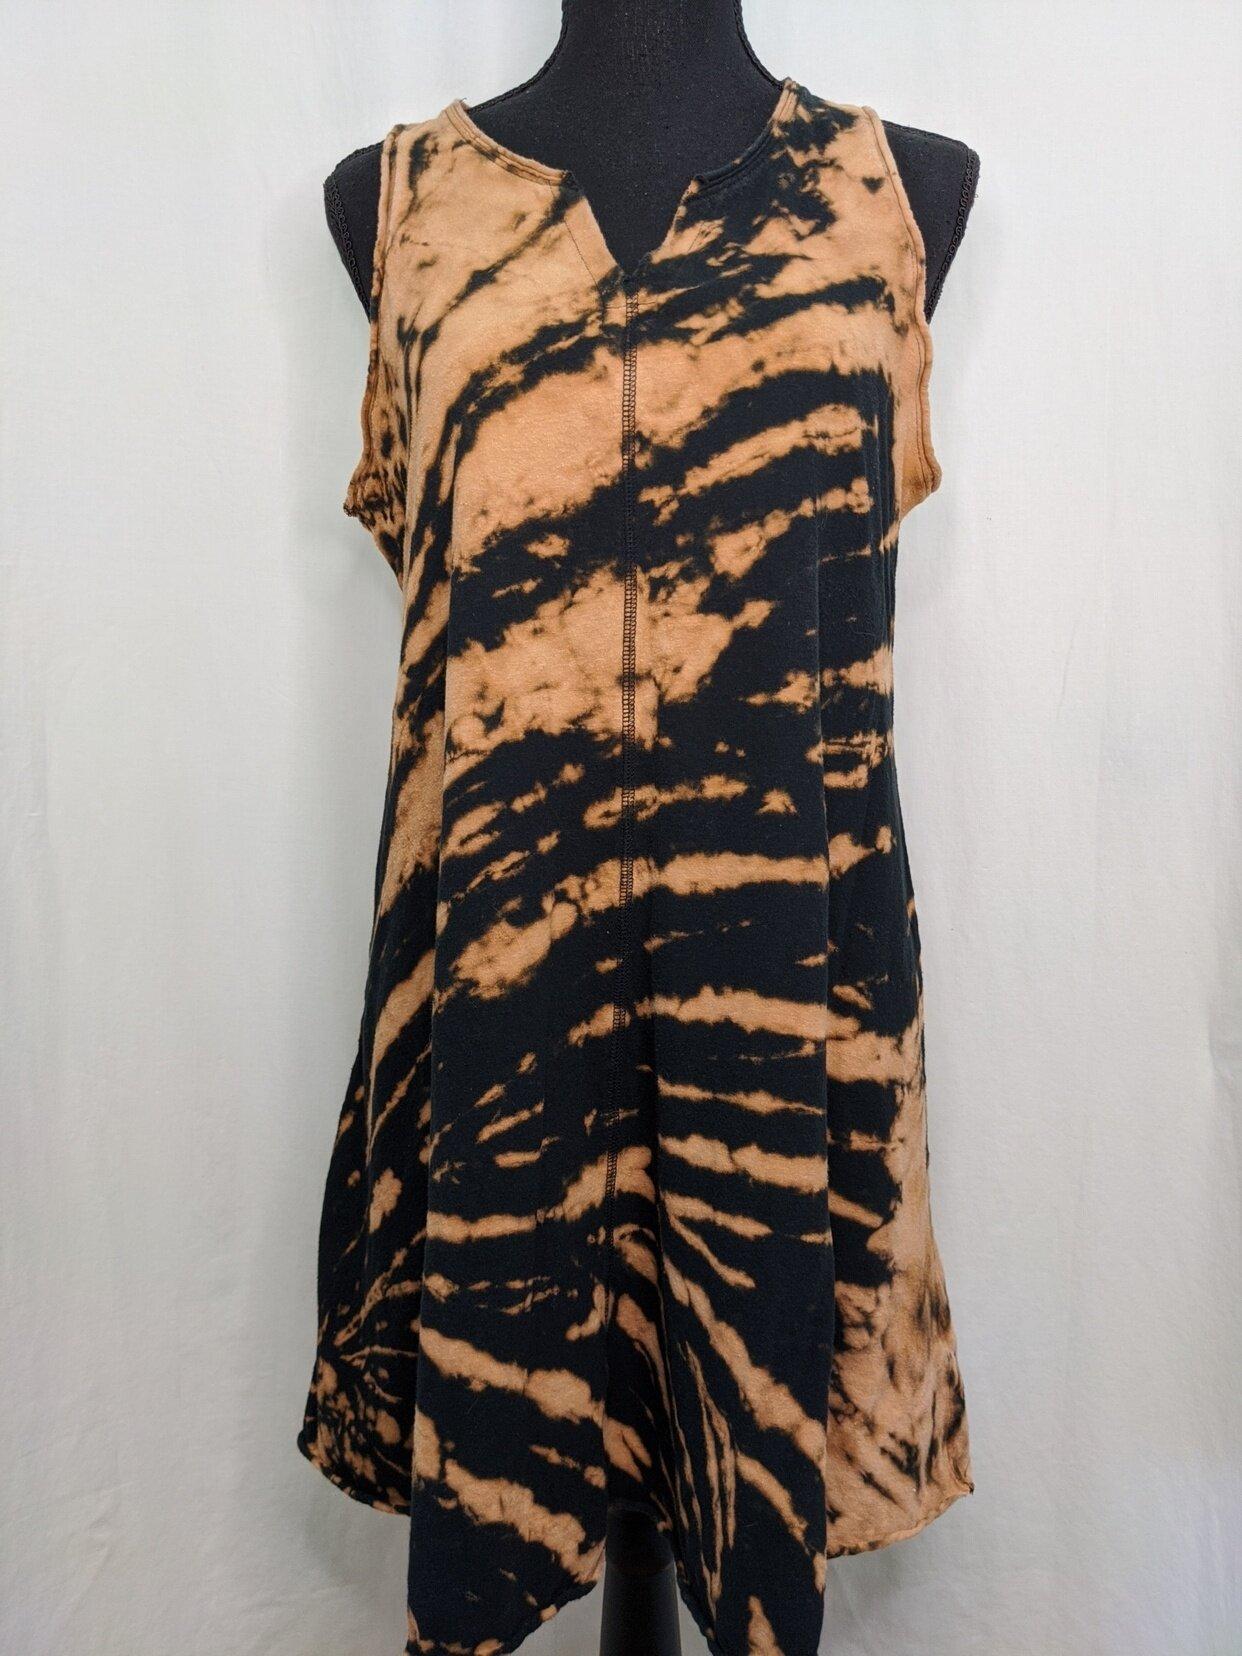 Size M Mystical Aura Bleach Dyed Dress